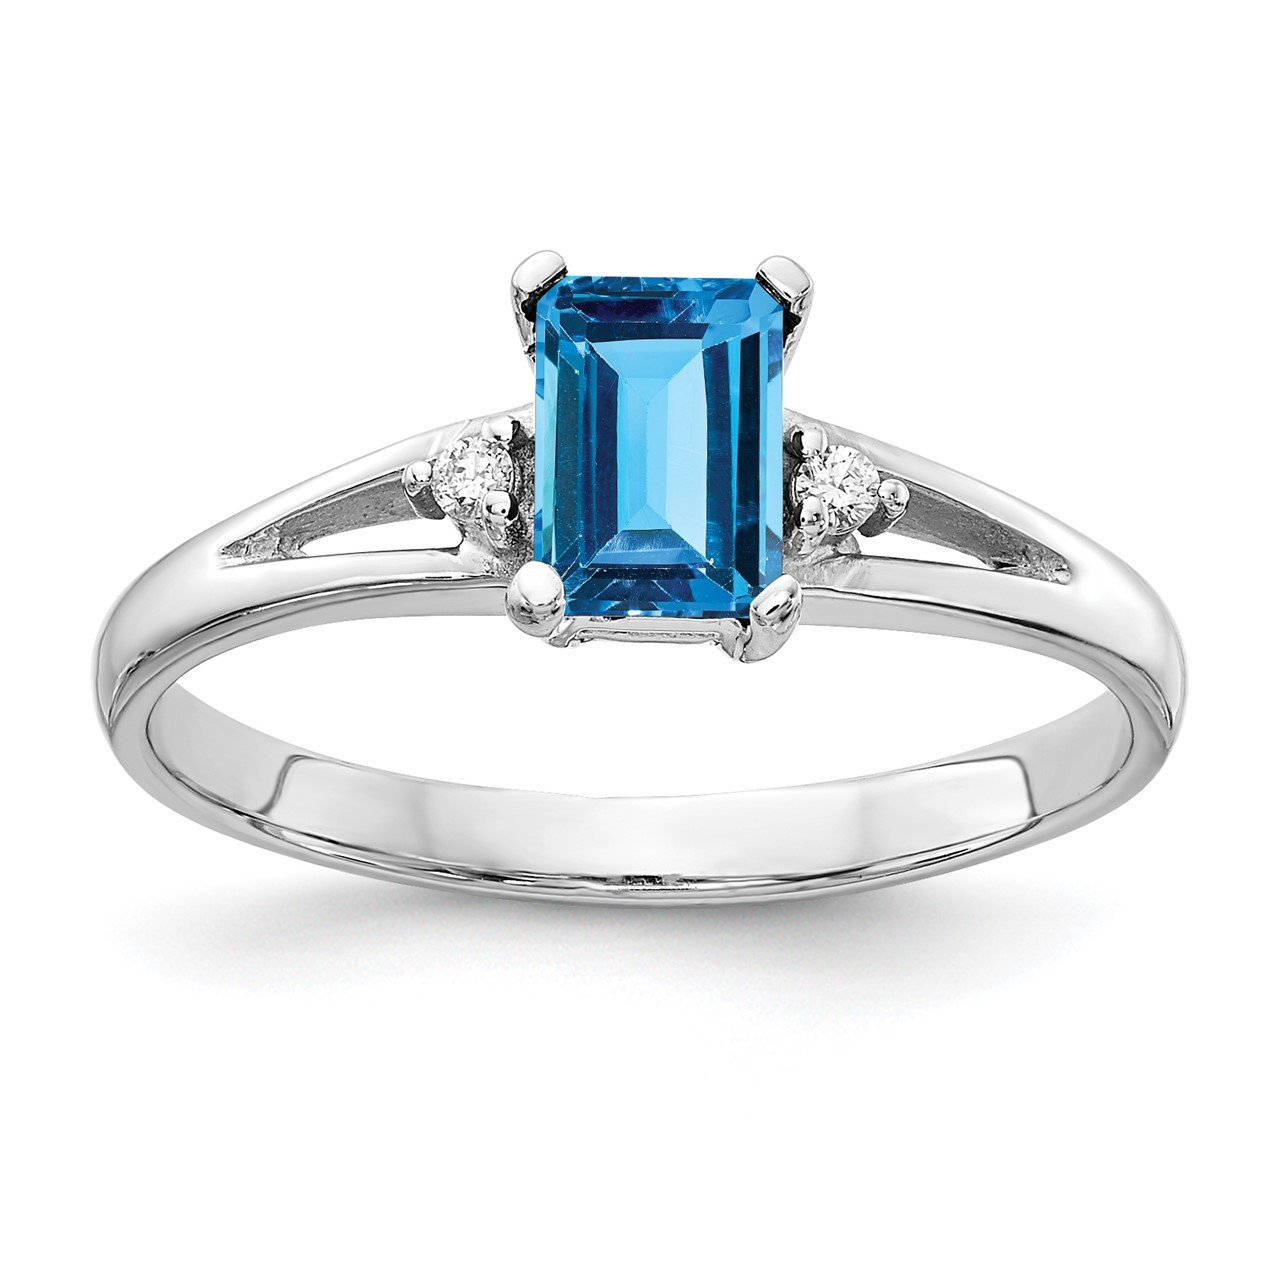 14k White Gold 6x4mm Emerald Cut Blue Topaz AA Diamond ring